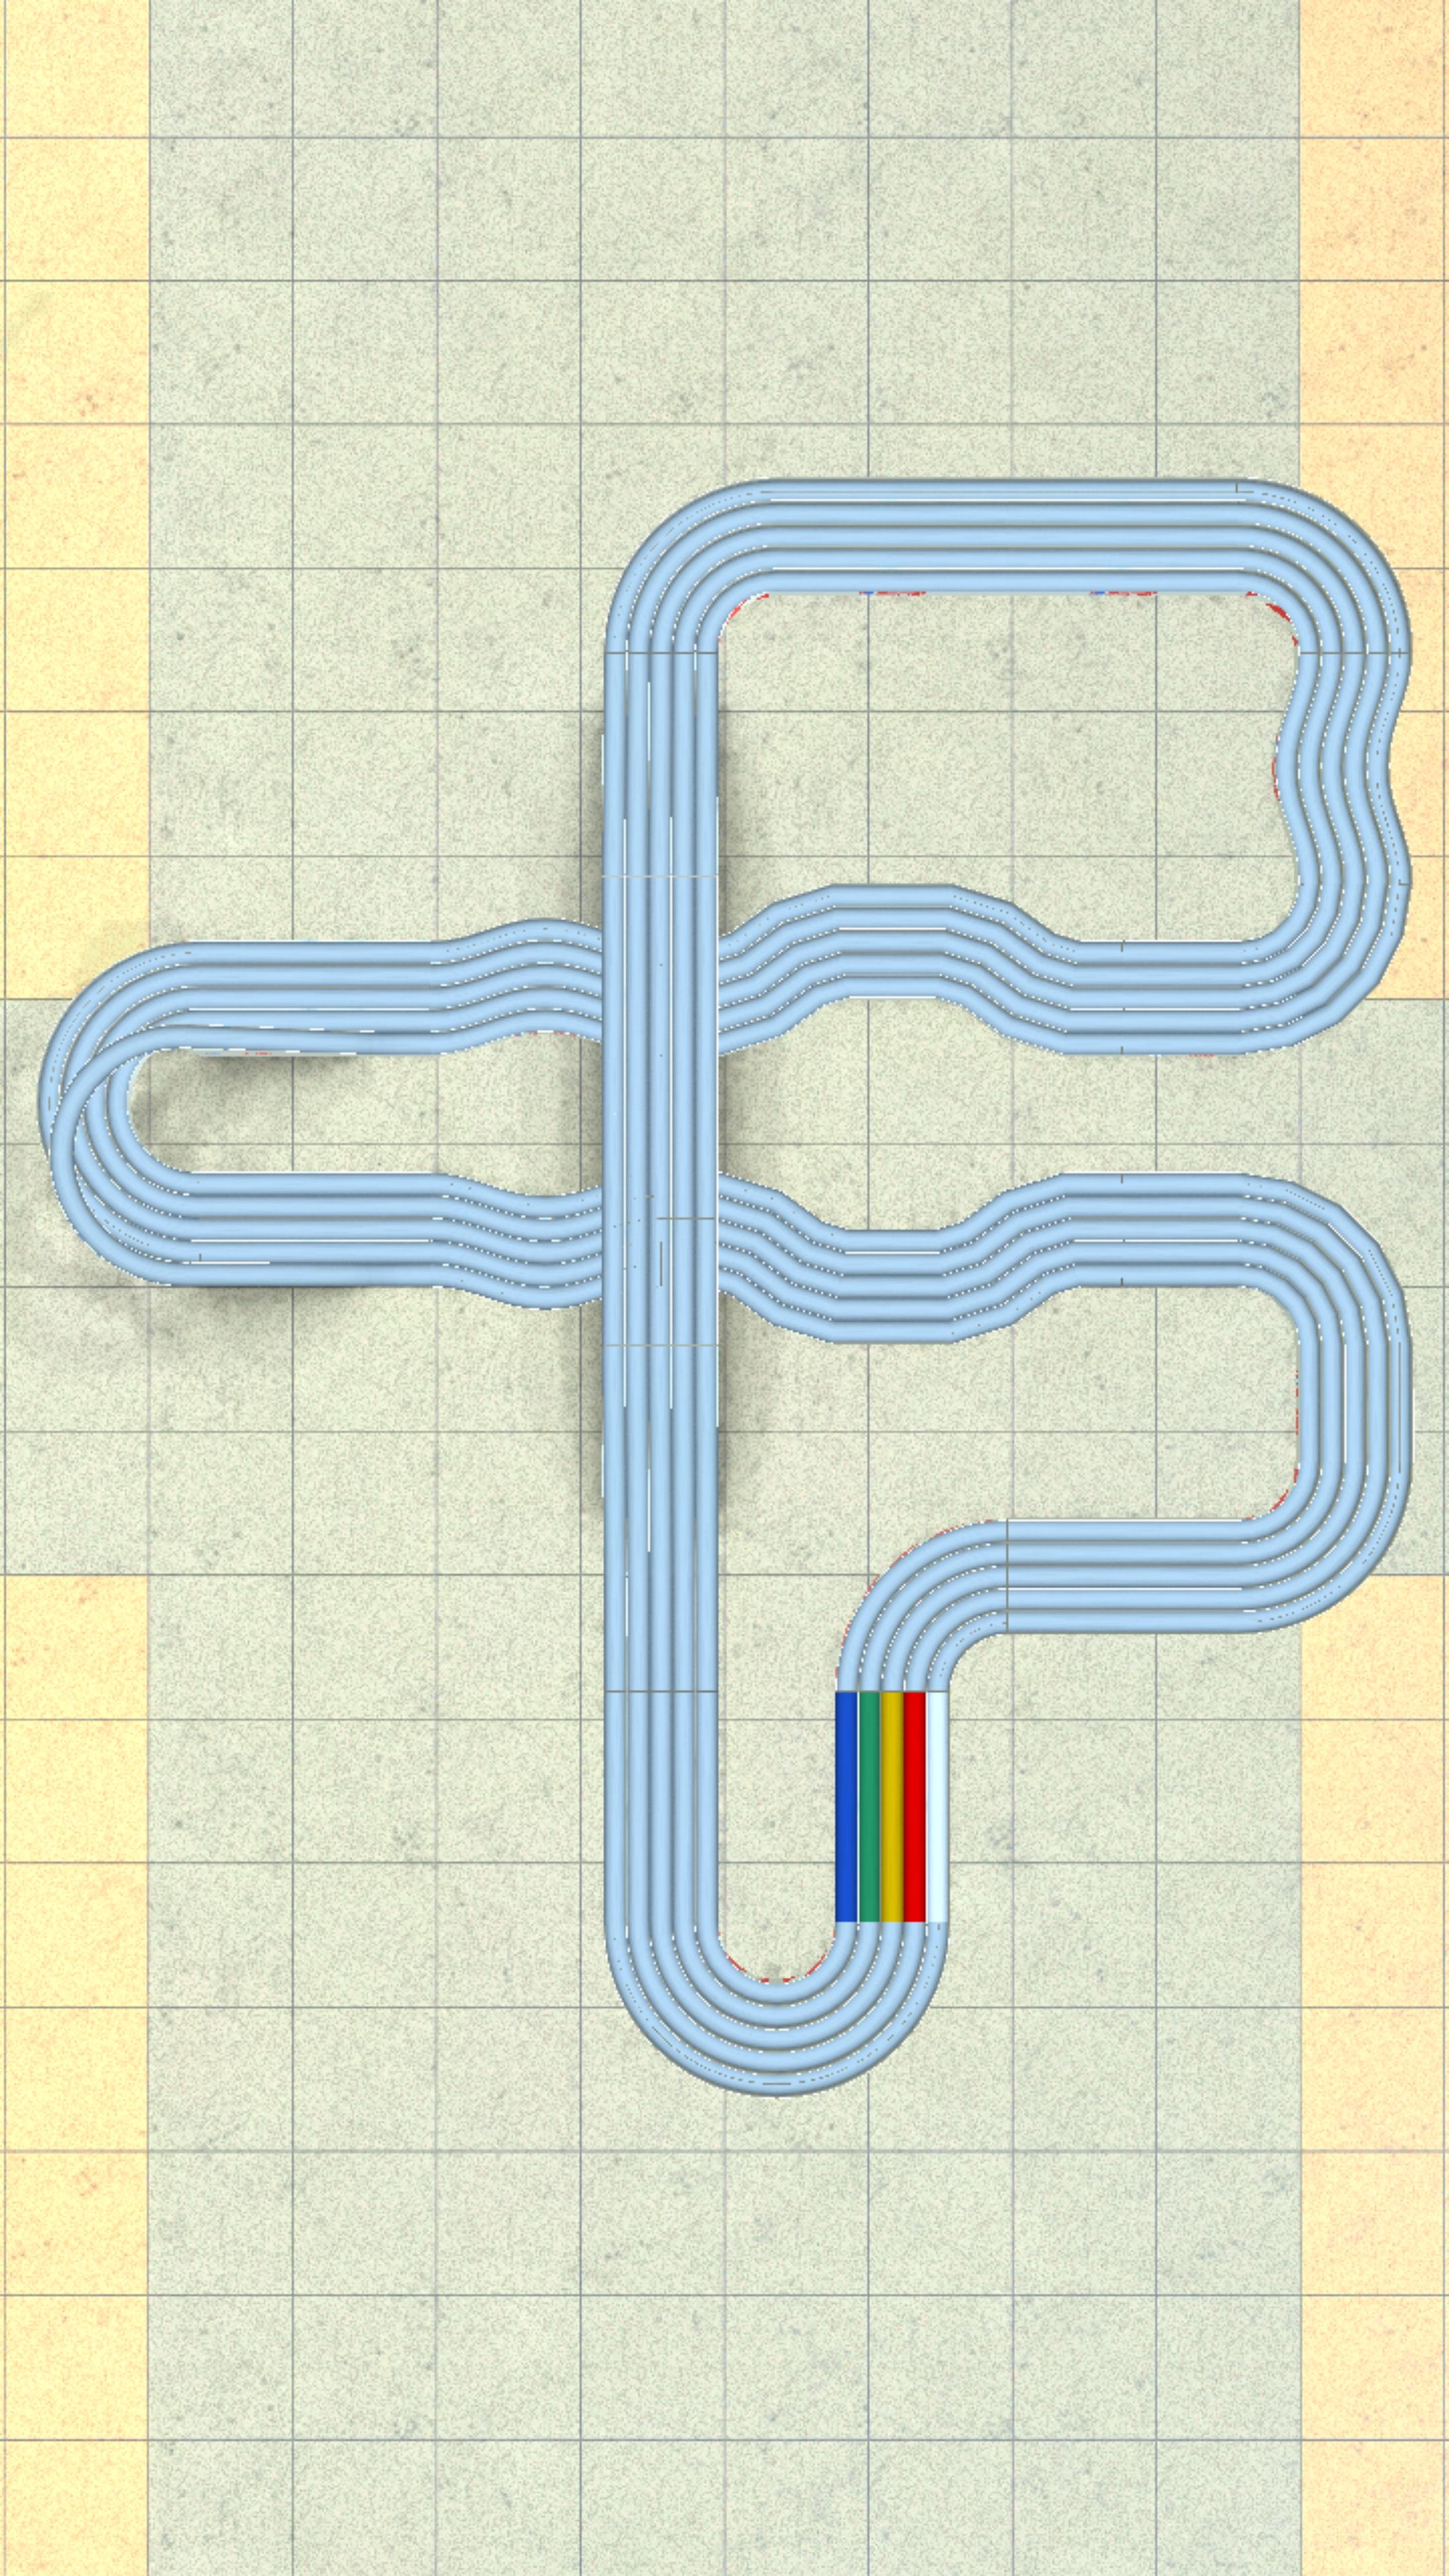 /theme/dengekionline/mini4wd/images/limited/S64-65_PRACTICE/02